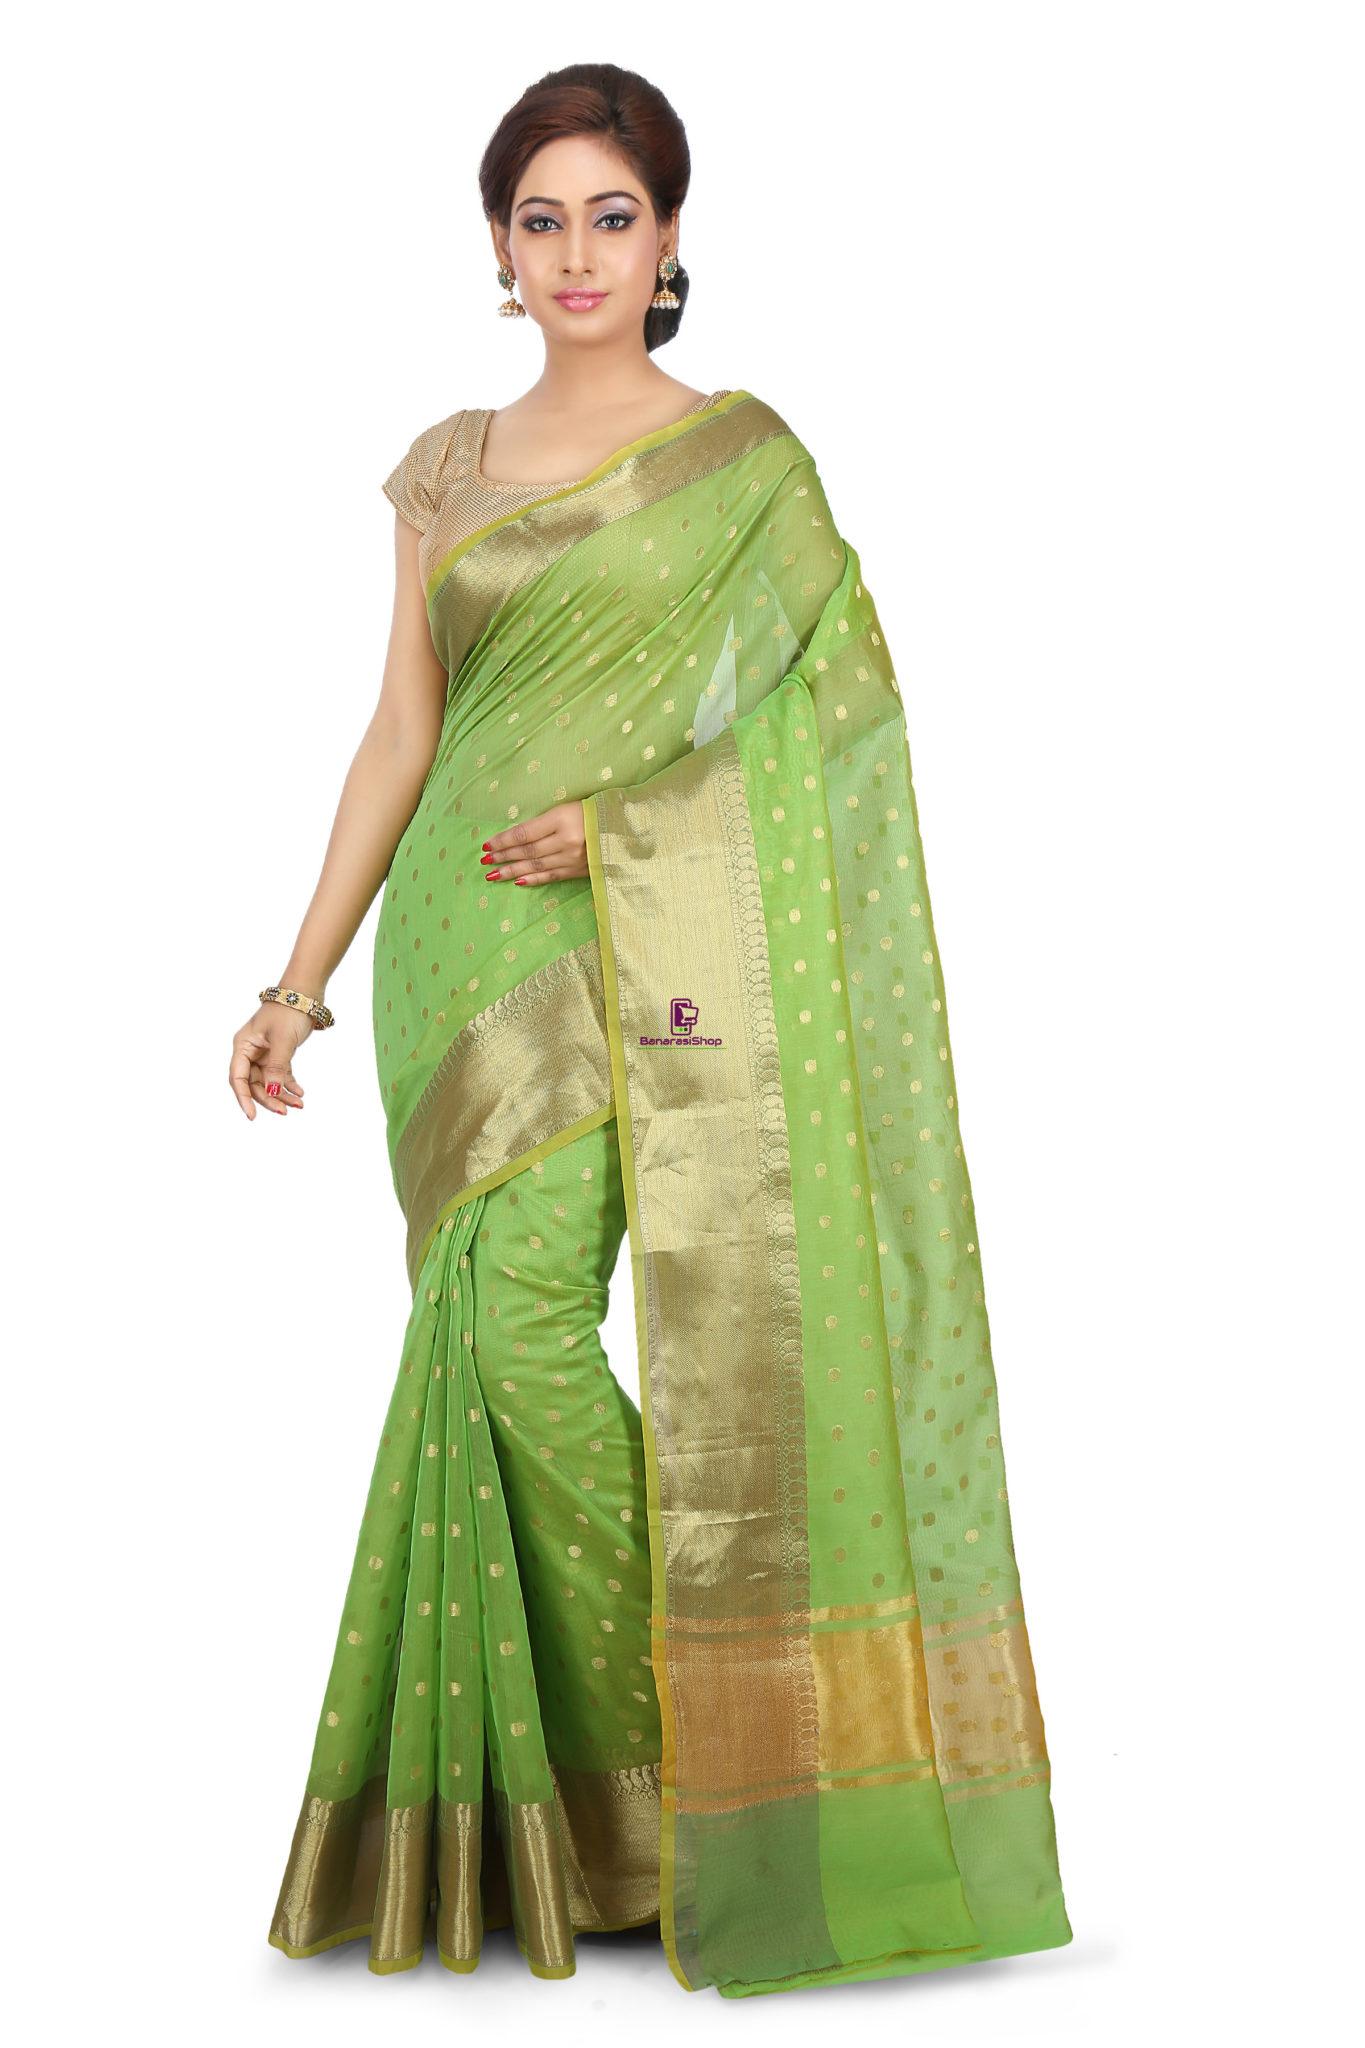 Woven Banarasi Cotton Silk Saree in Light Green 1